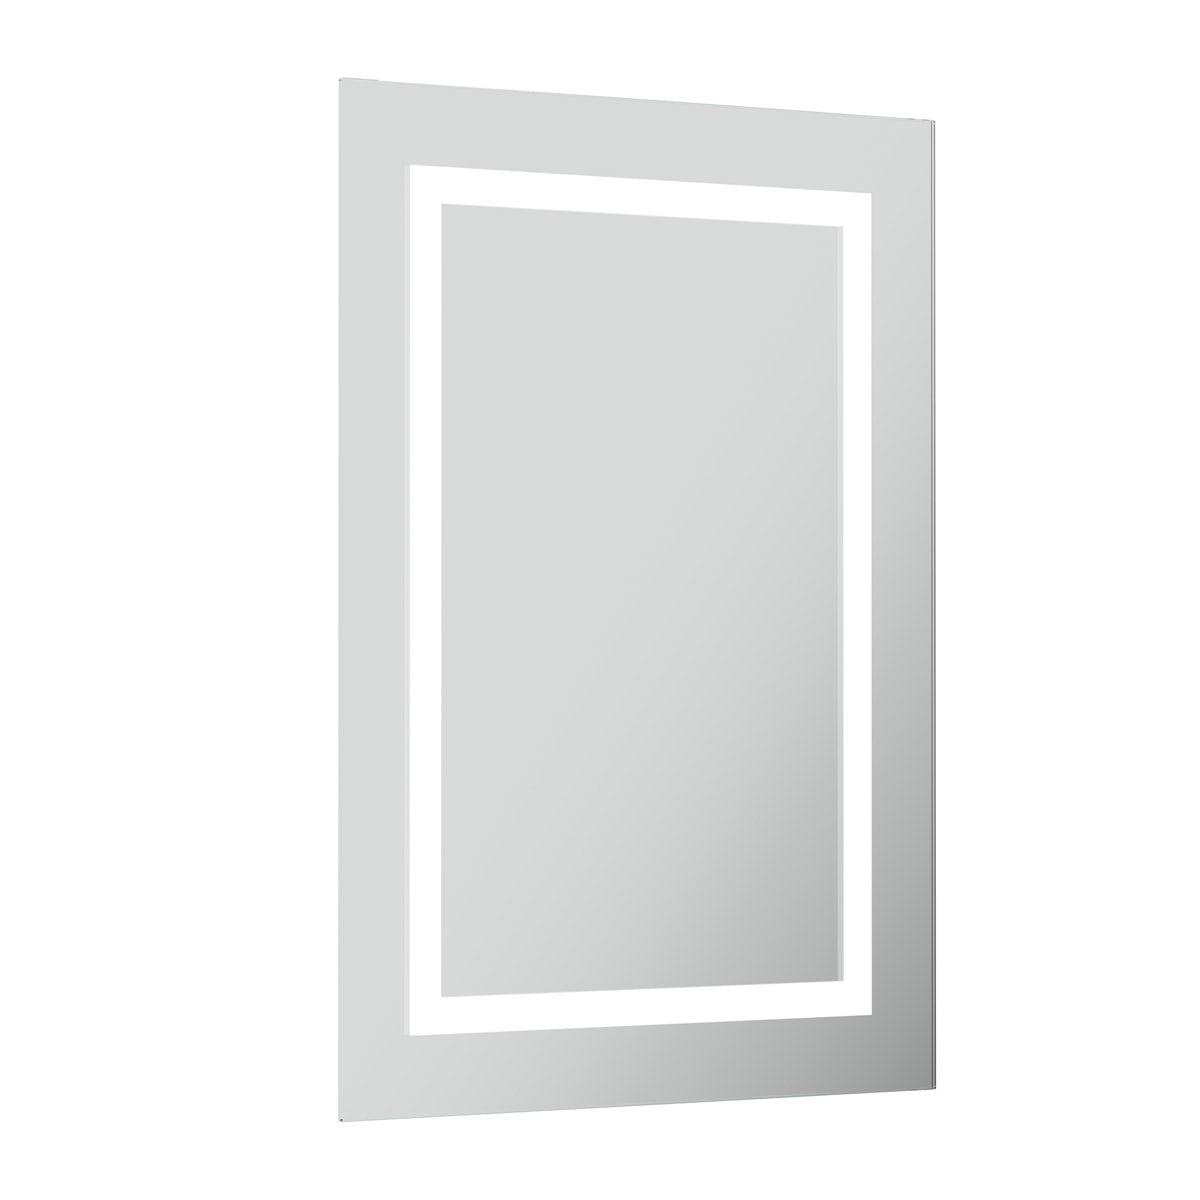 Shine rectangular LED mirror